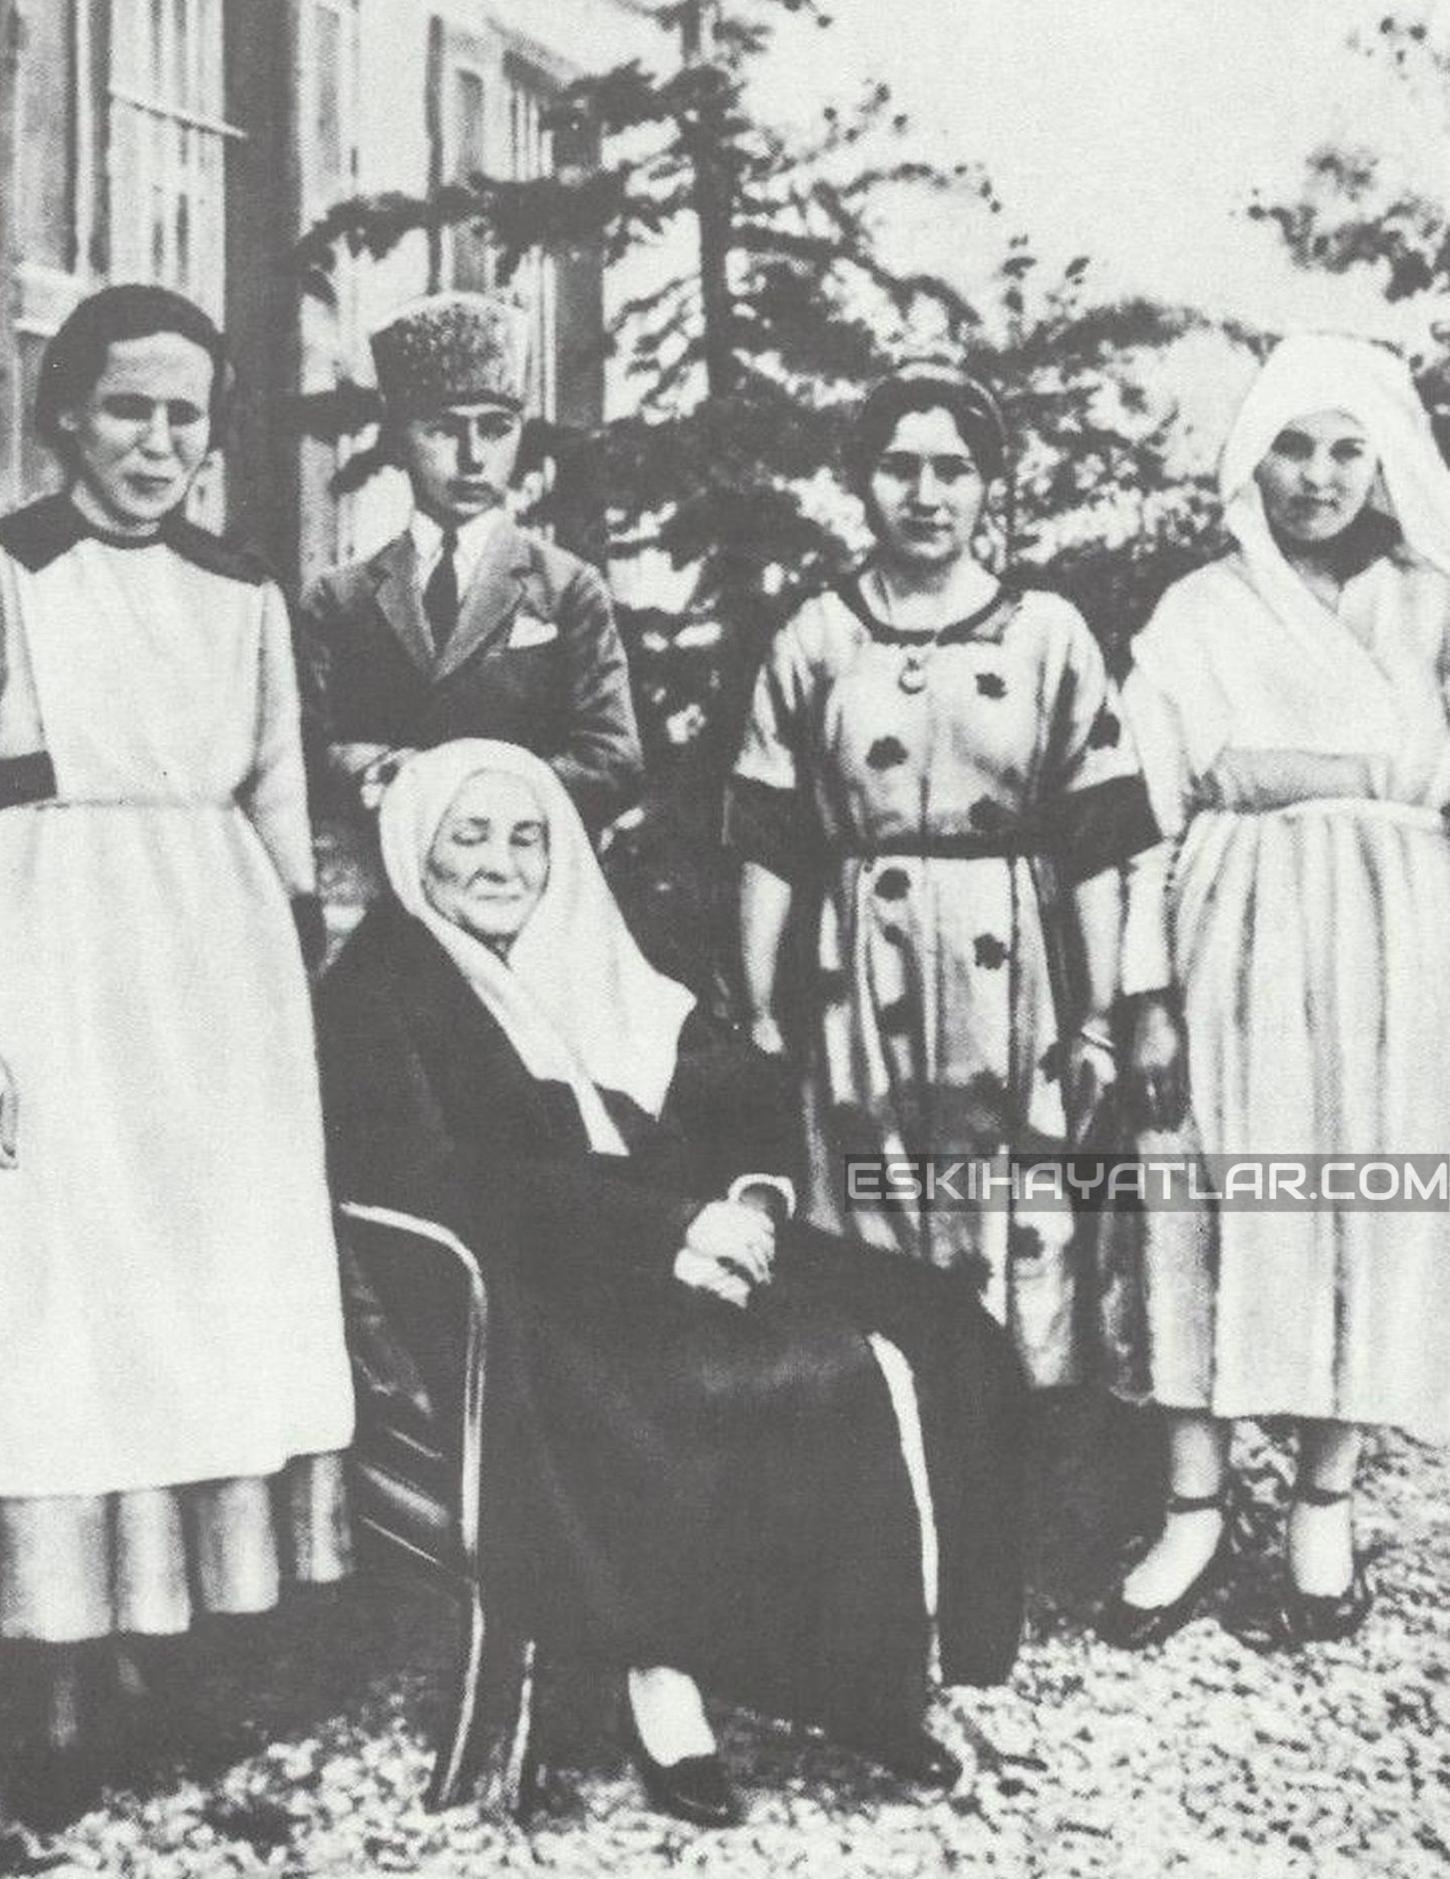 ataturk-izmir-gunleri-mustafa-kemal-pasa-1922-izmir-fotograflari (8)